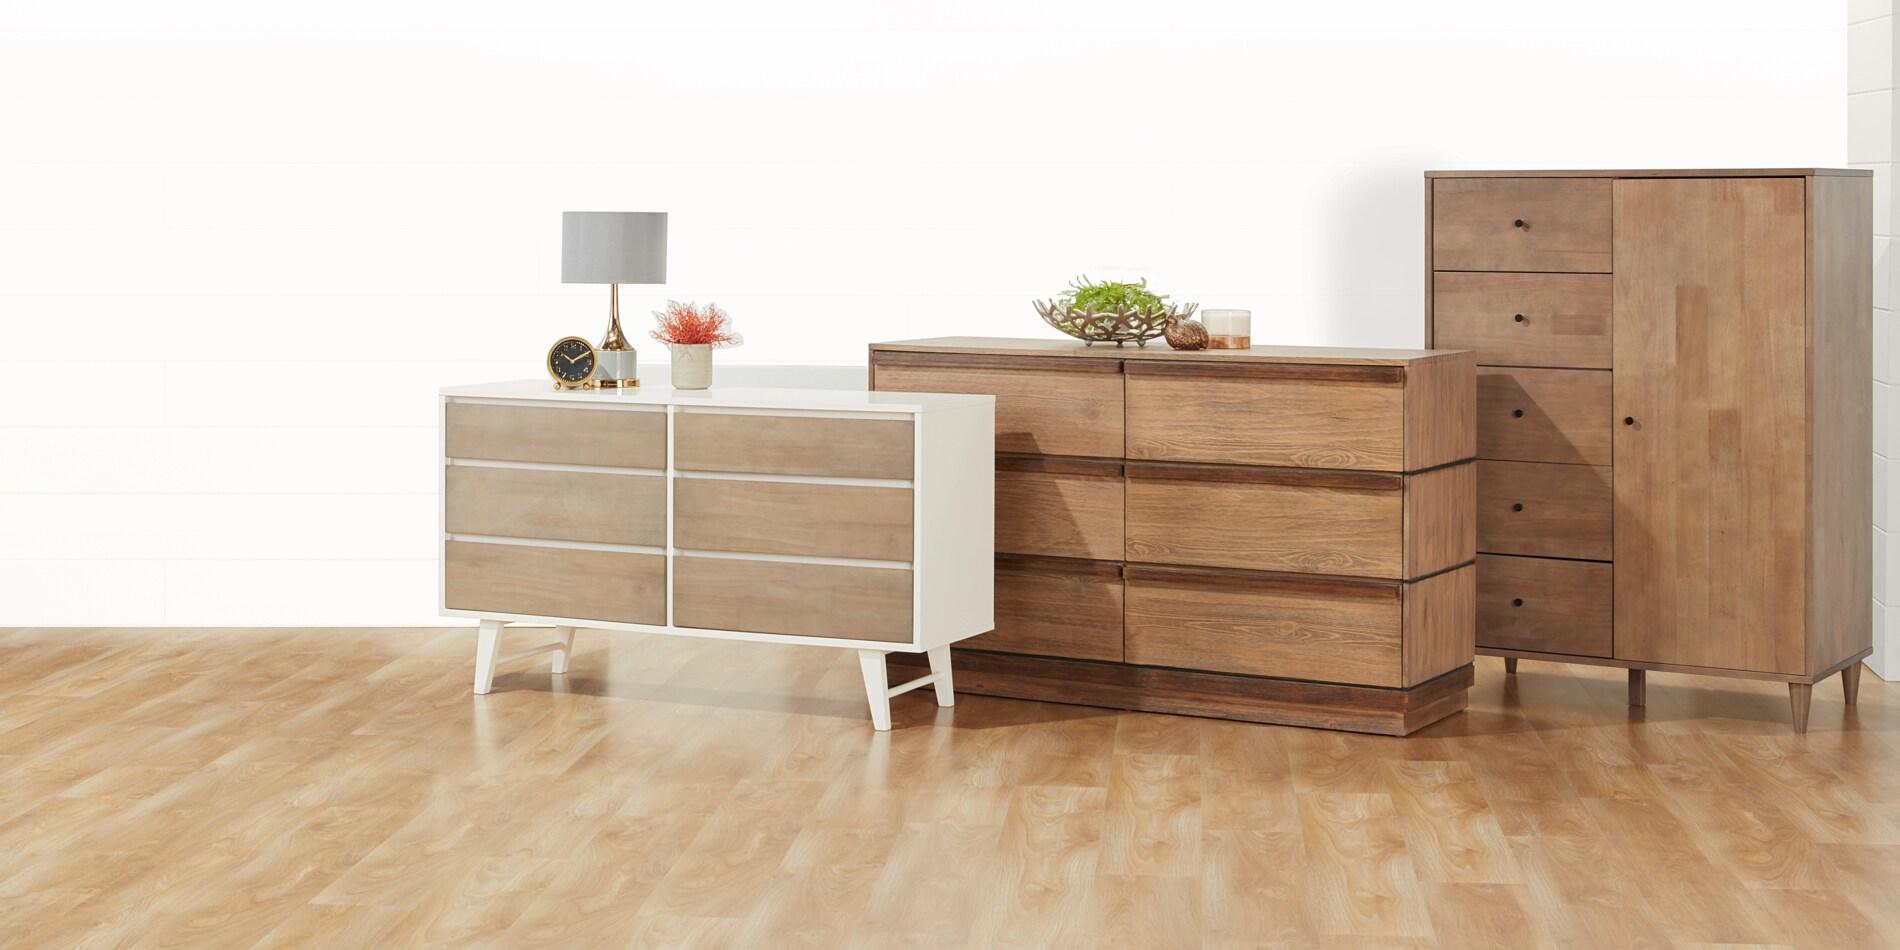 Buy dressers chests online at overstock com our best bedroom furniture deals